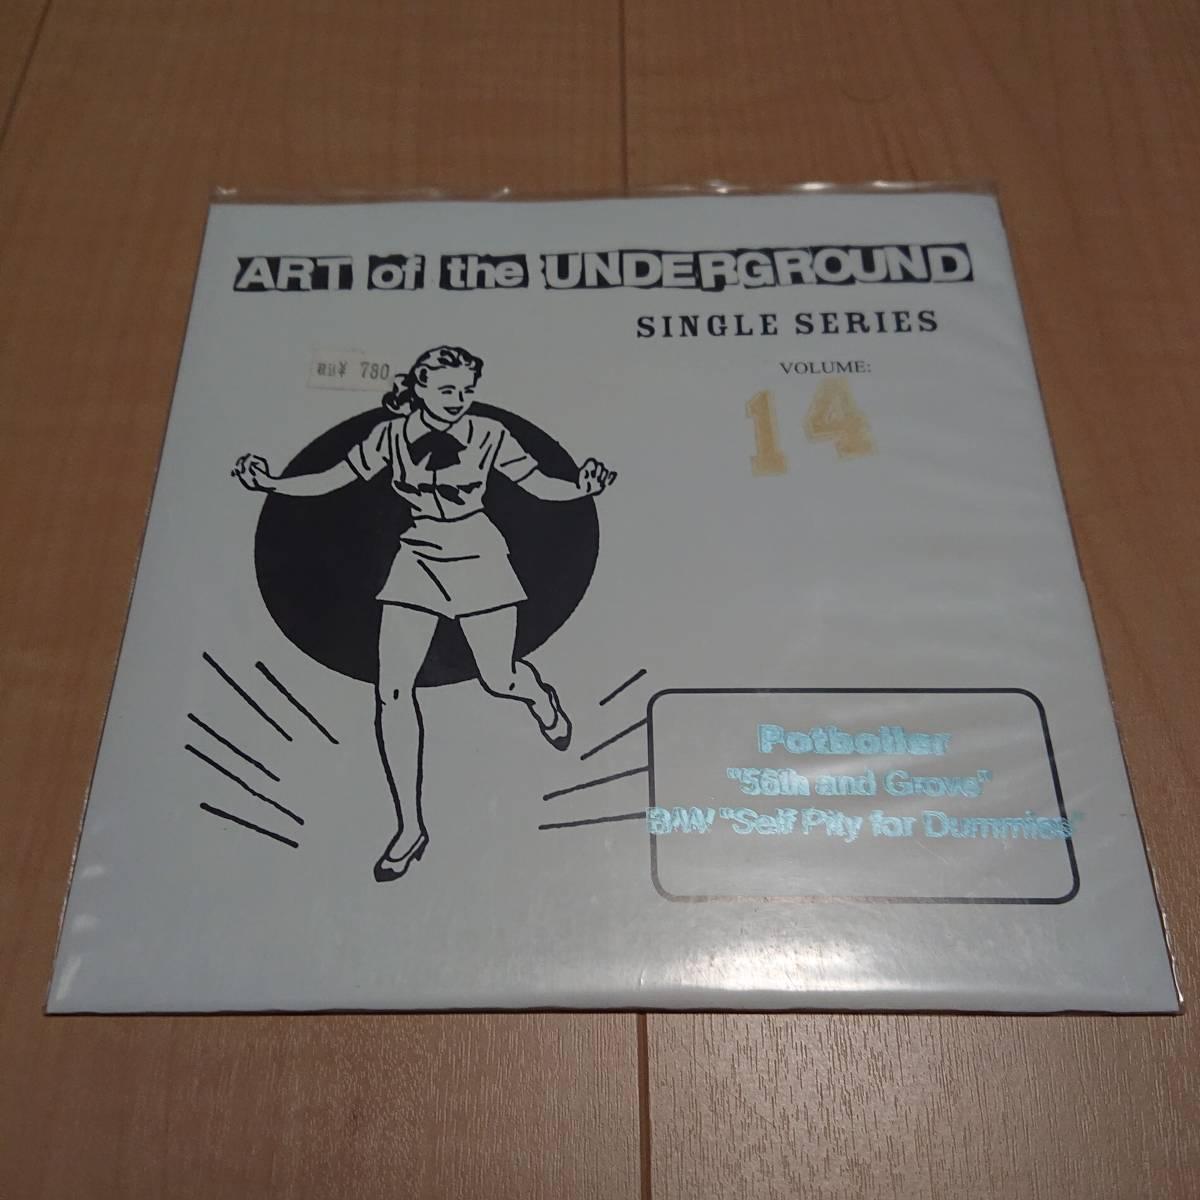 【Potboiler - Art Of The Underground Single Series】latterman rvivr iron chic jawberaker